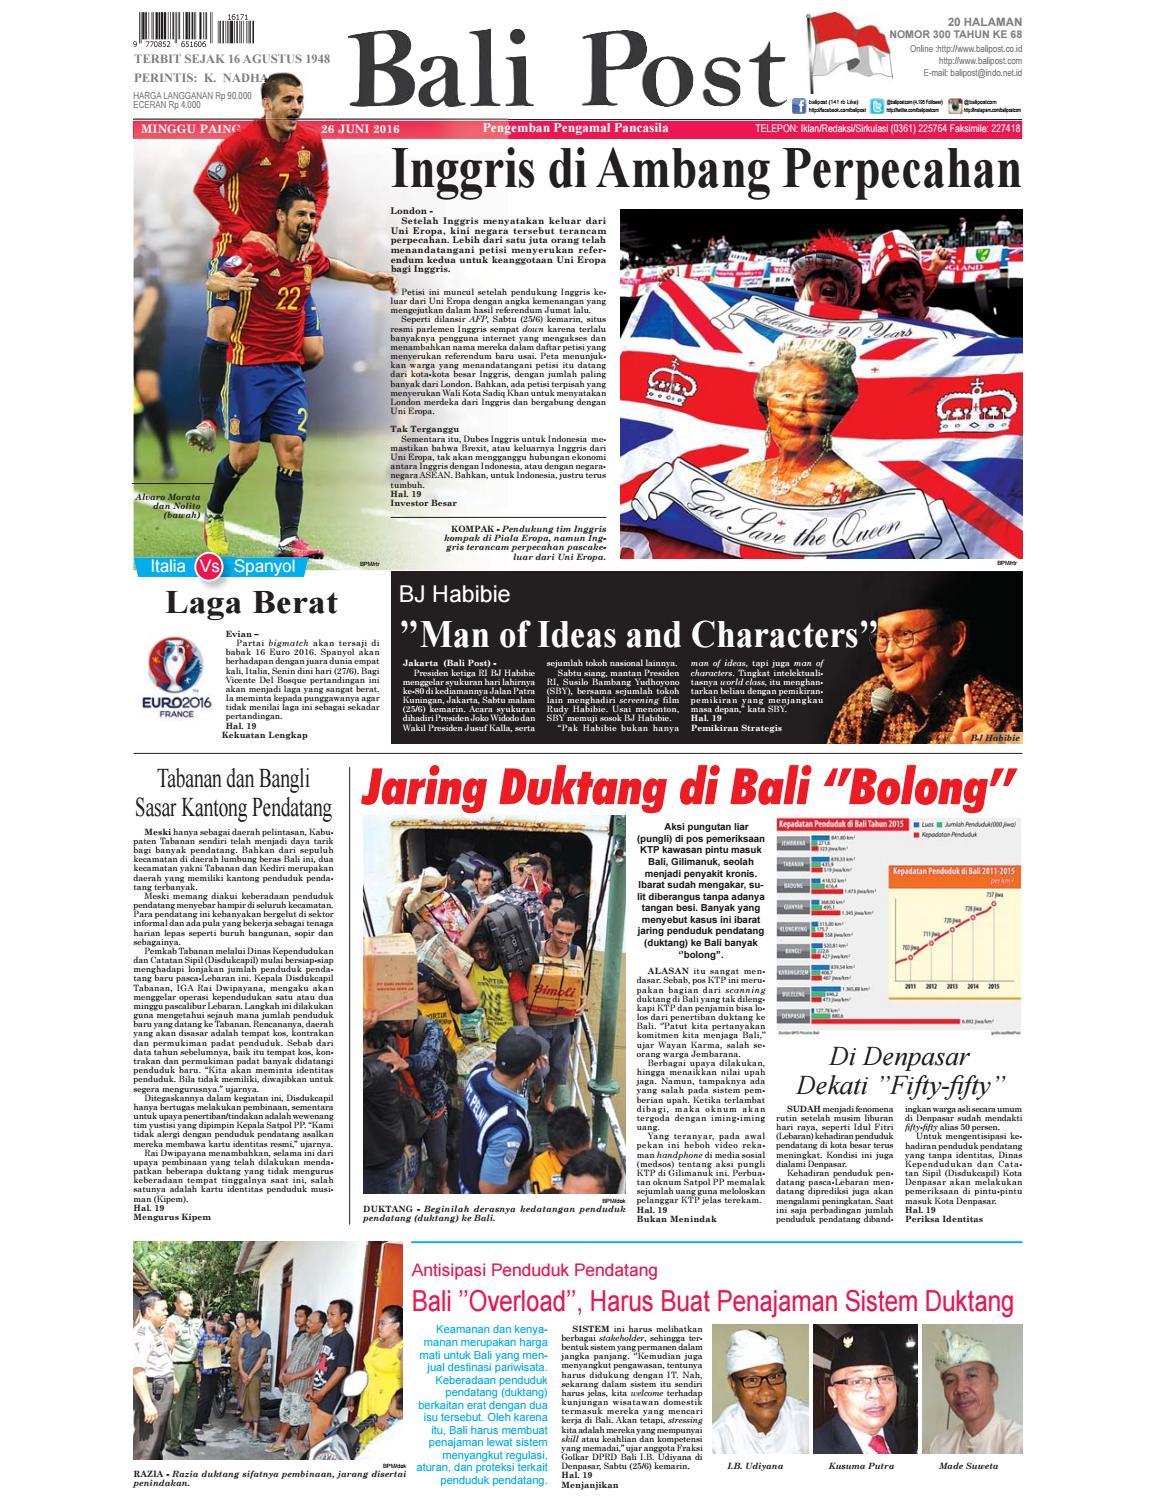 Edisi 26 Juni 2016 Balipostcom By E Paper KMB Issuu